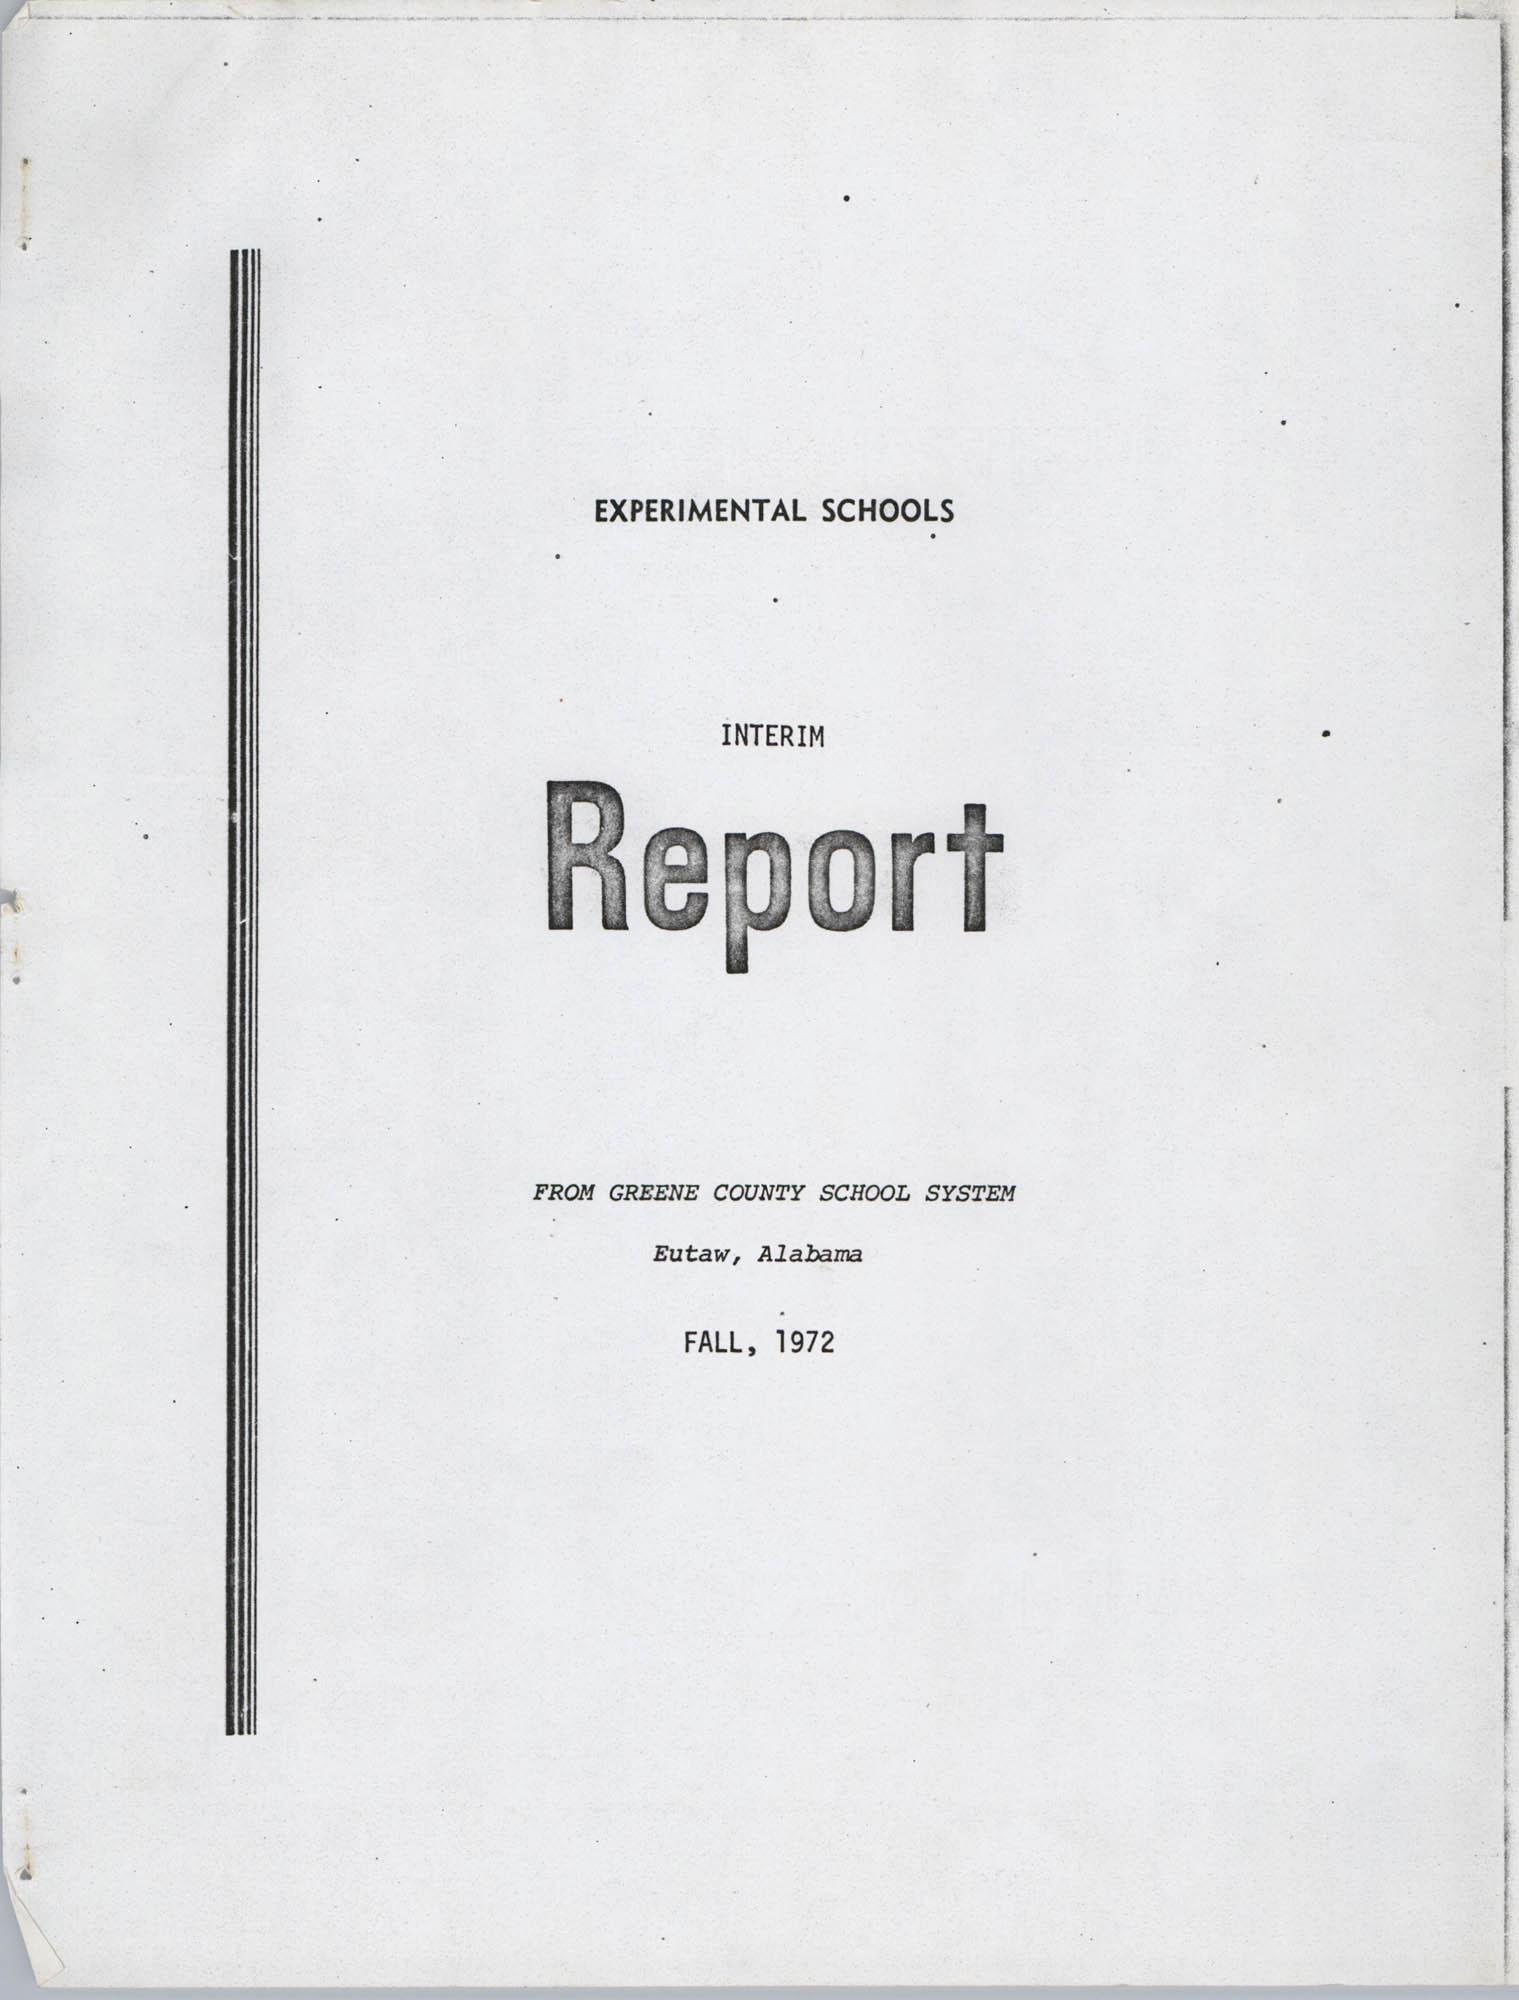 Experimental Schools Interim Report, Greene County School System